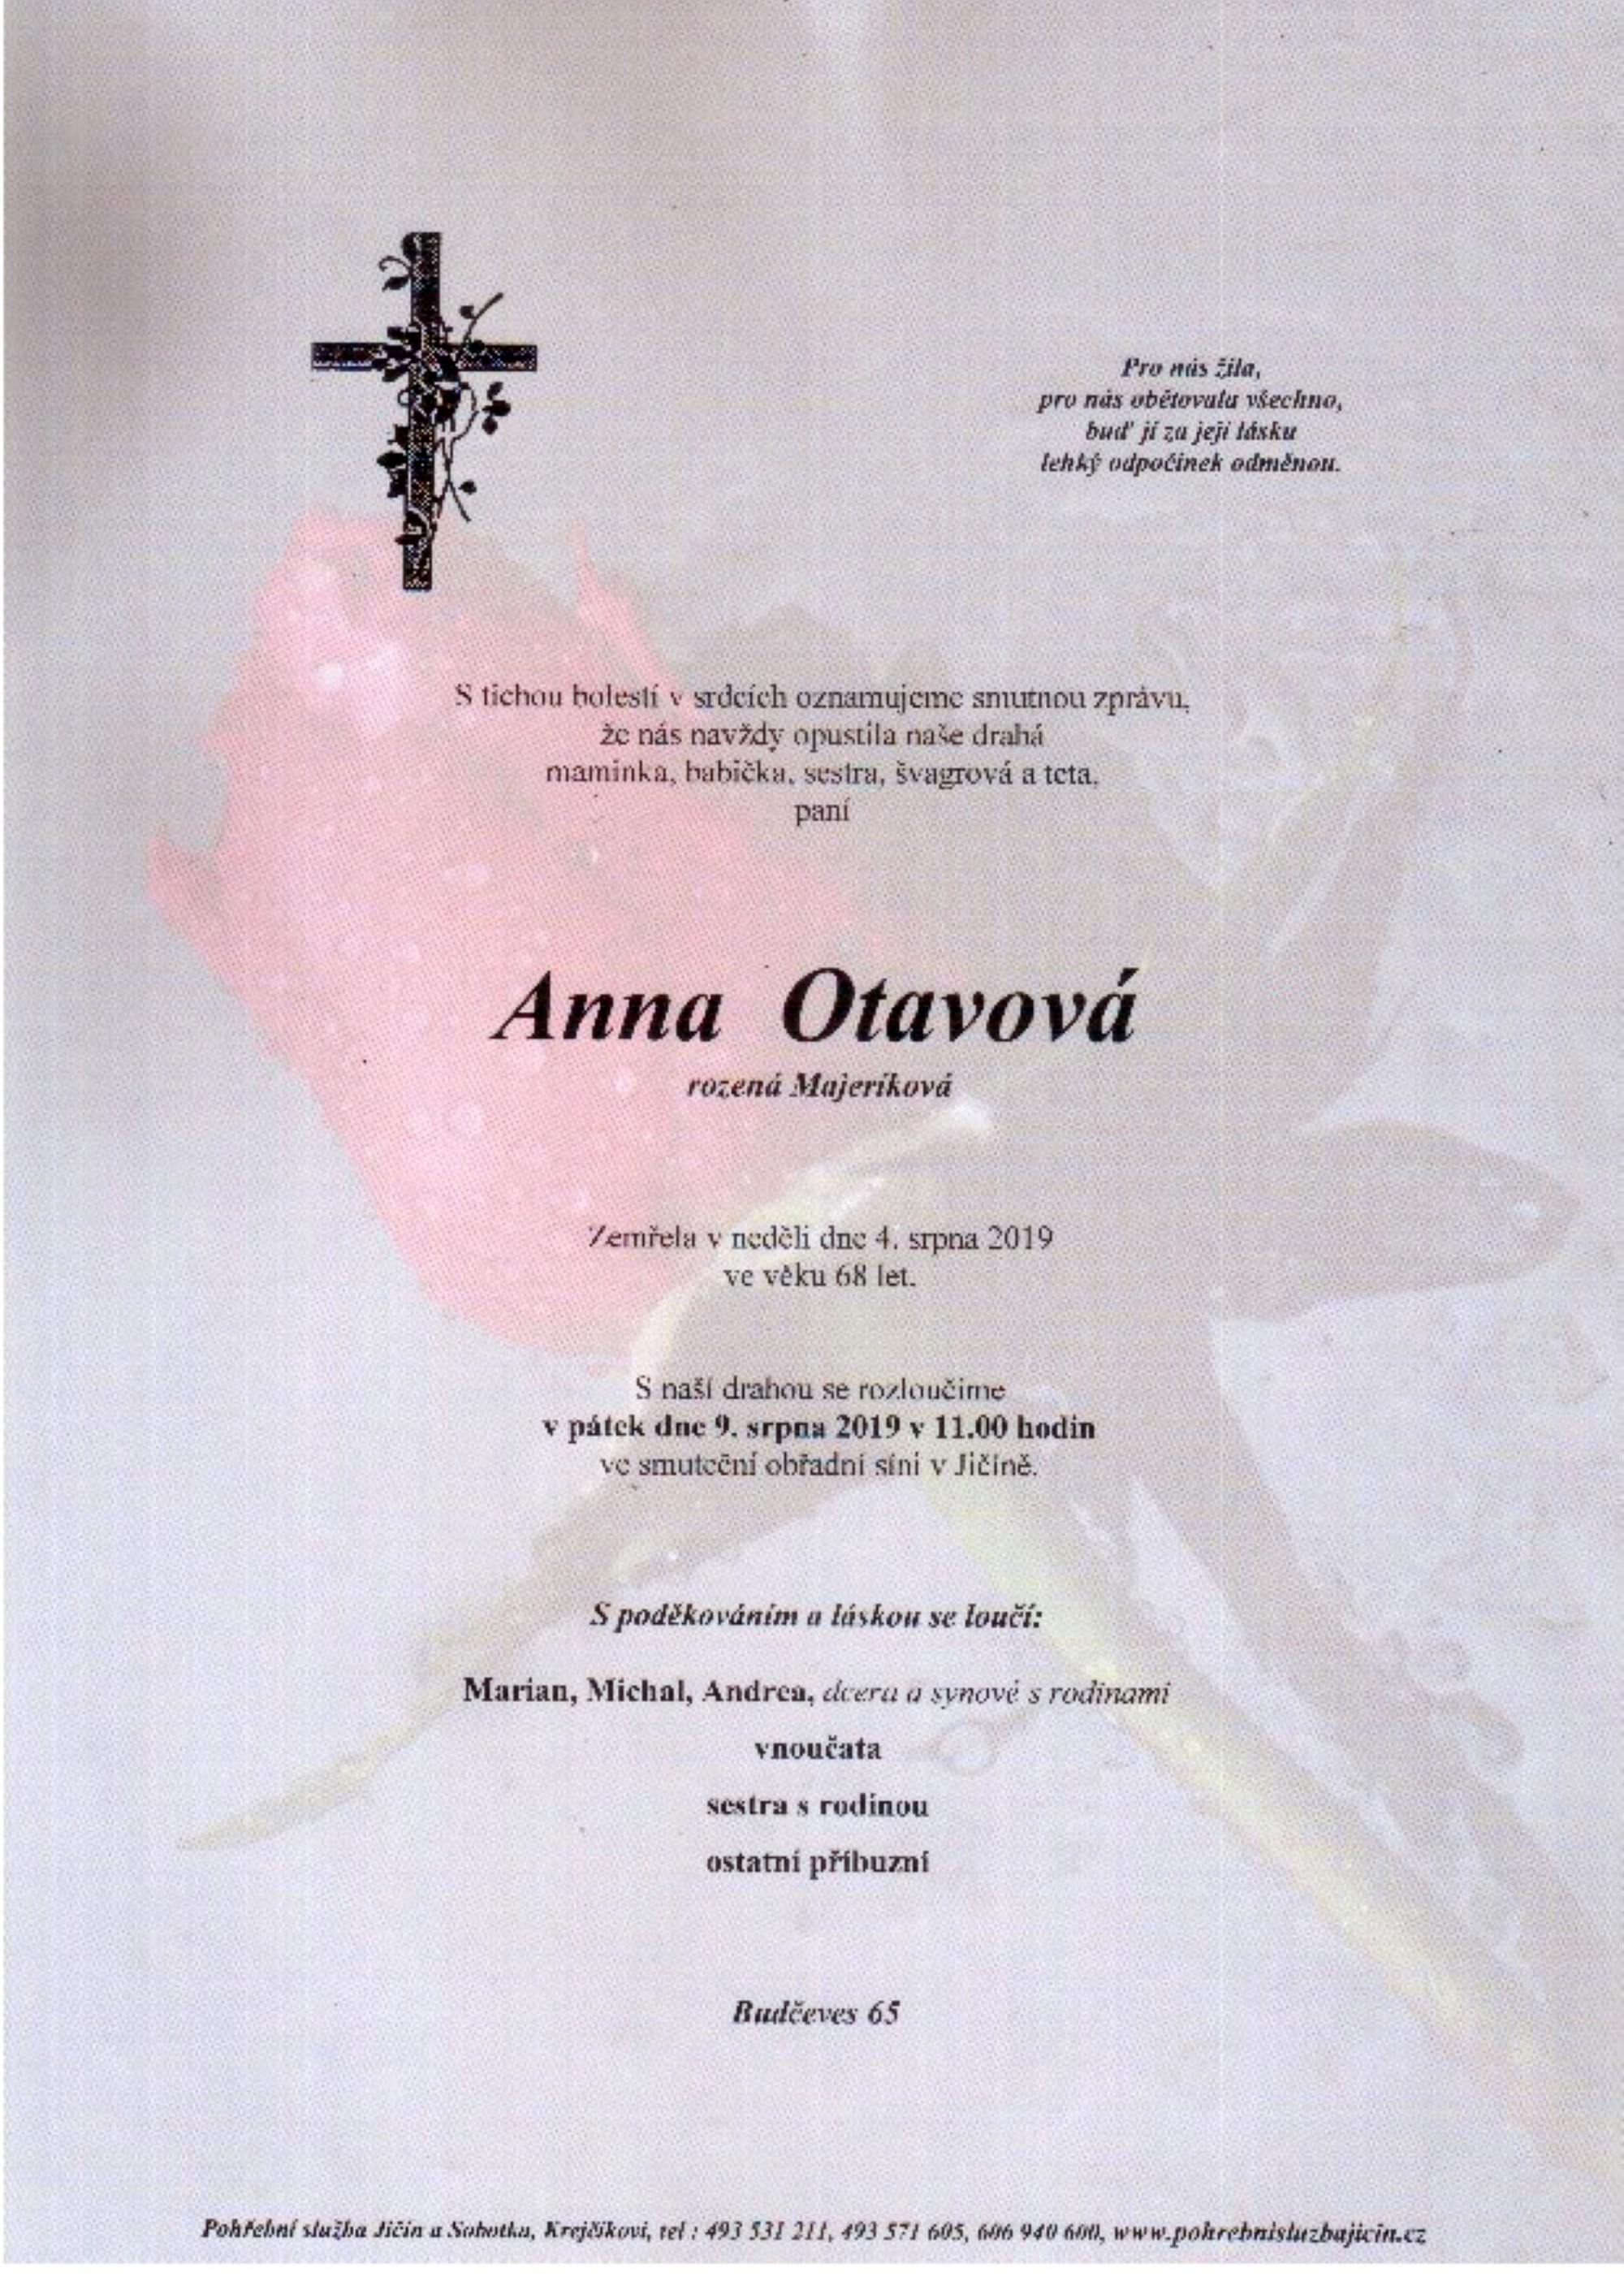 Anna Otavová